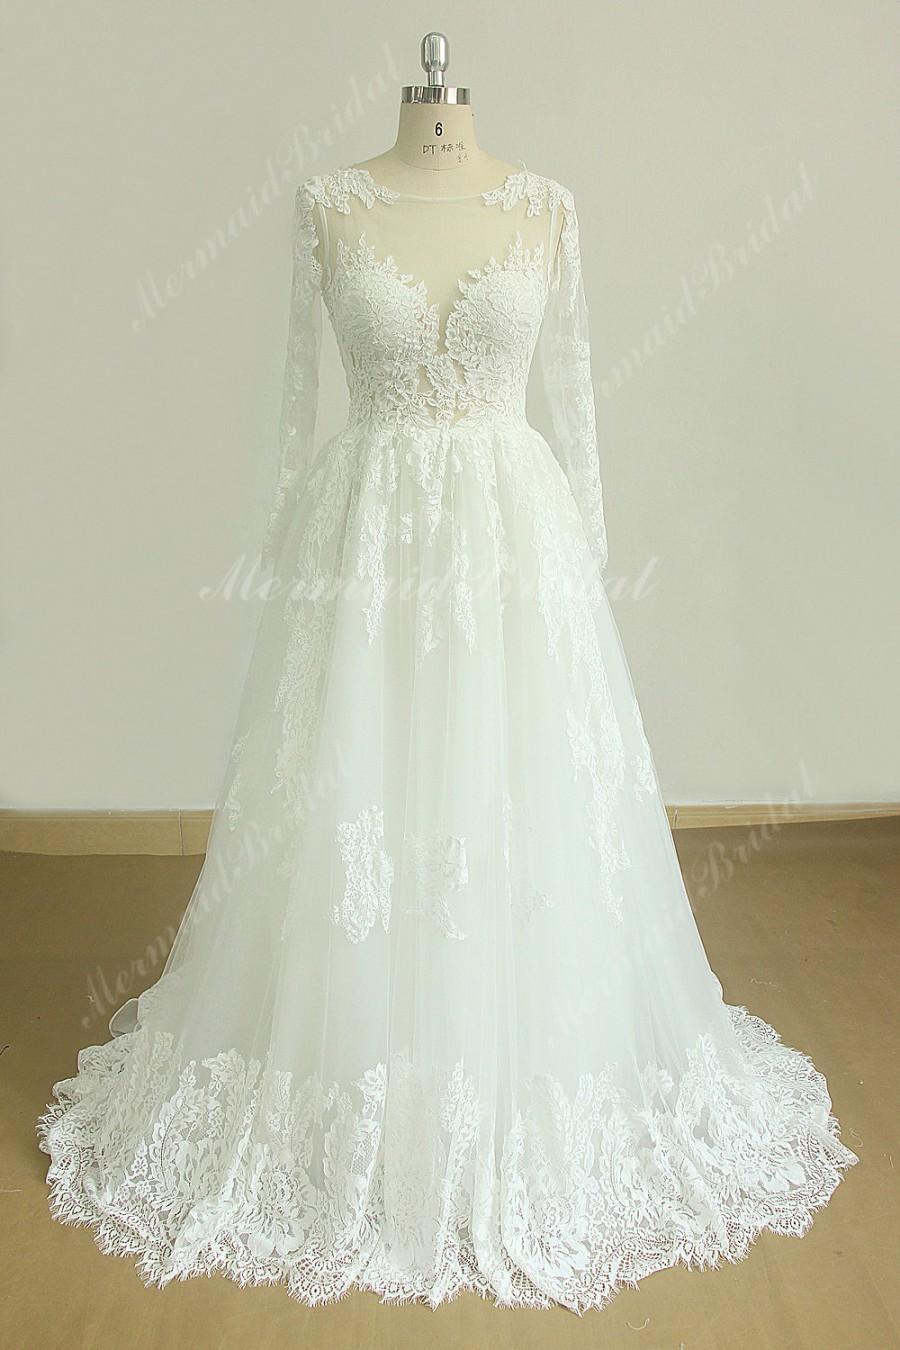 زفاف - Romantic a line french lace wedding dress with keyhole back and long seelves